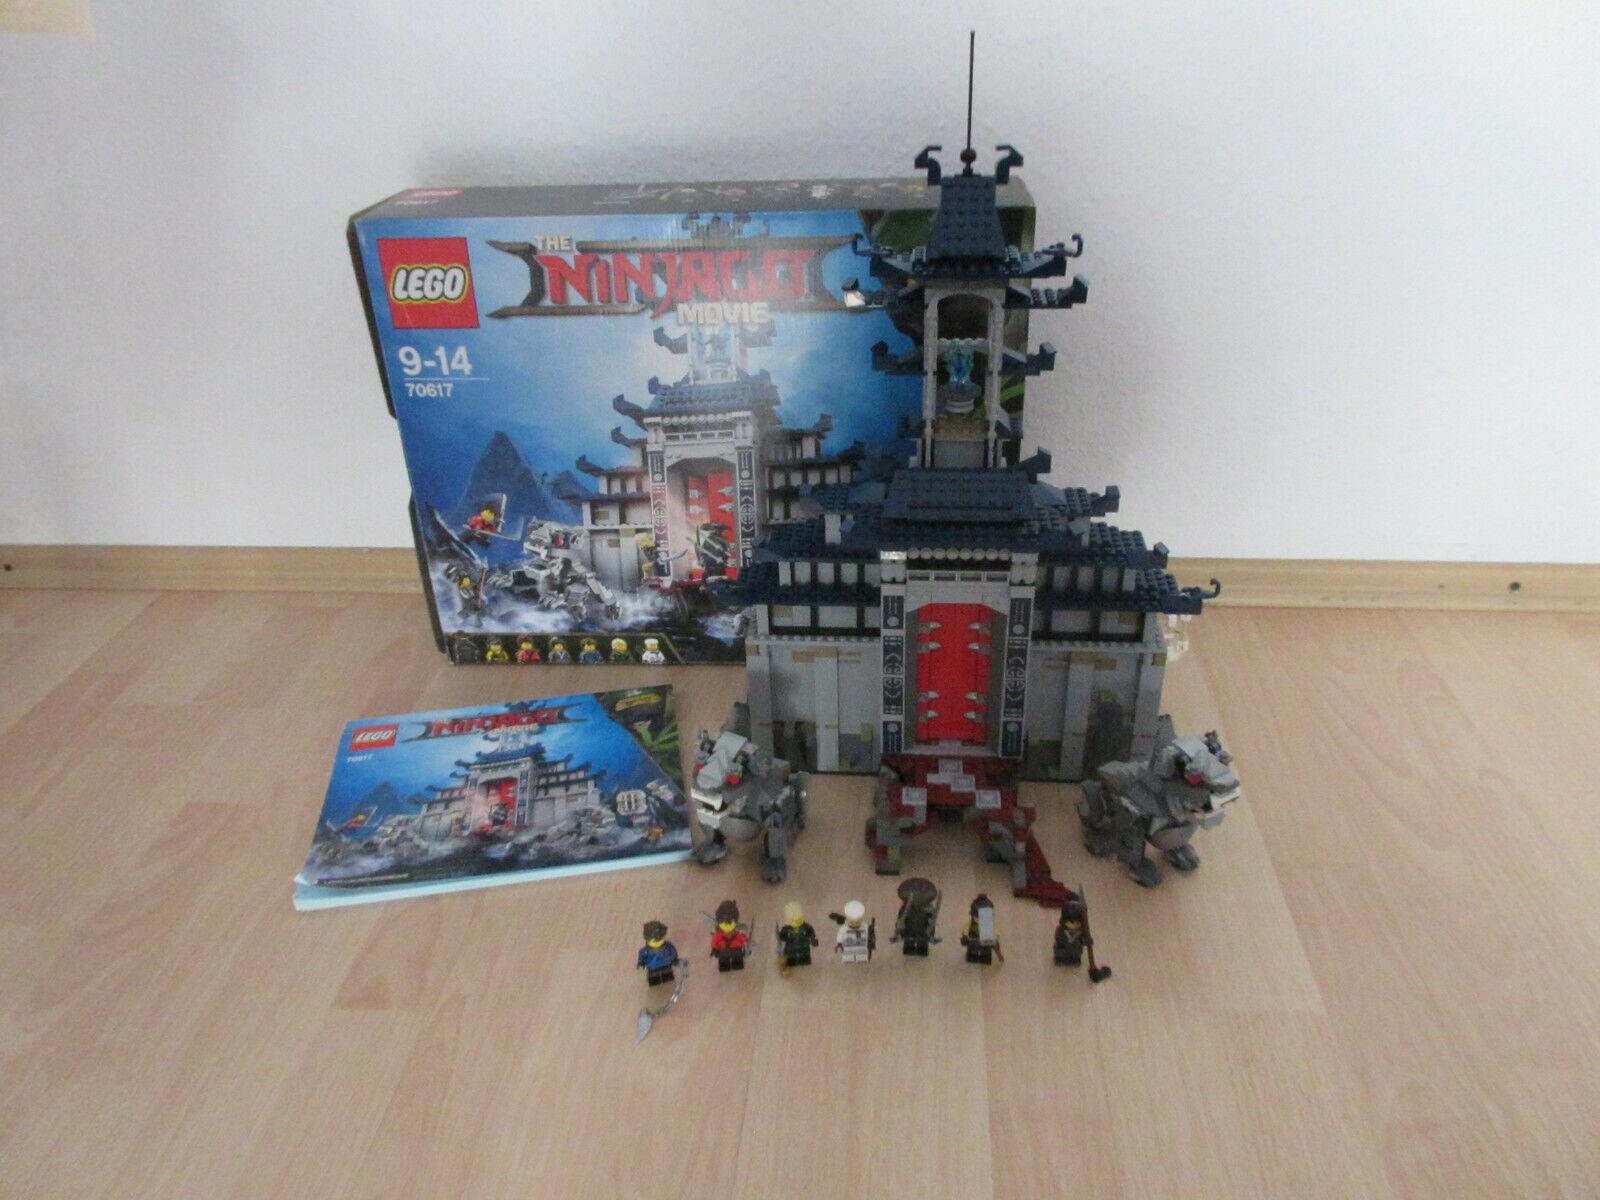 LEGo Ninjago 70617 Ultimativ Tempel Versteck mit Figuren, Bauplan & Karton